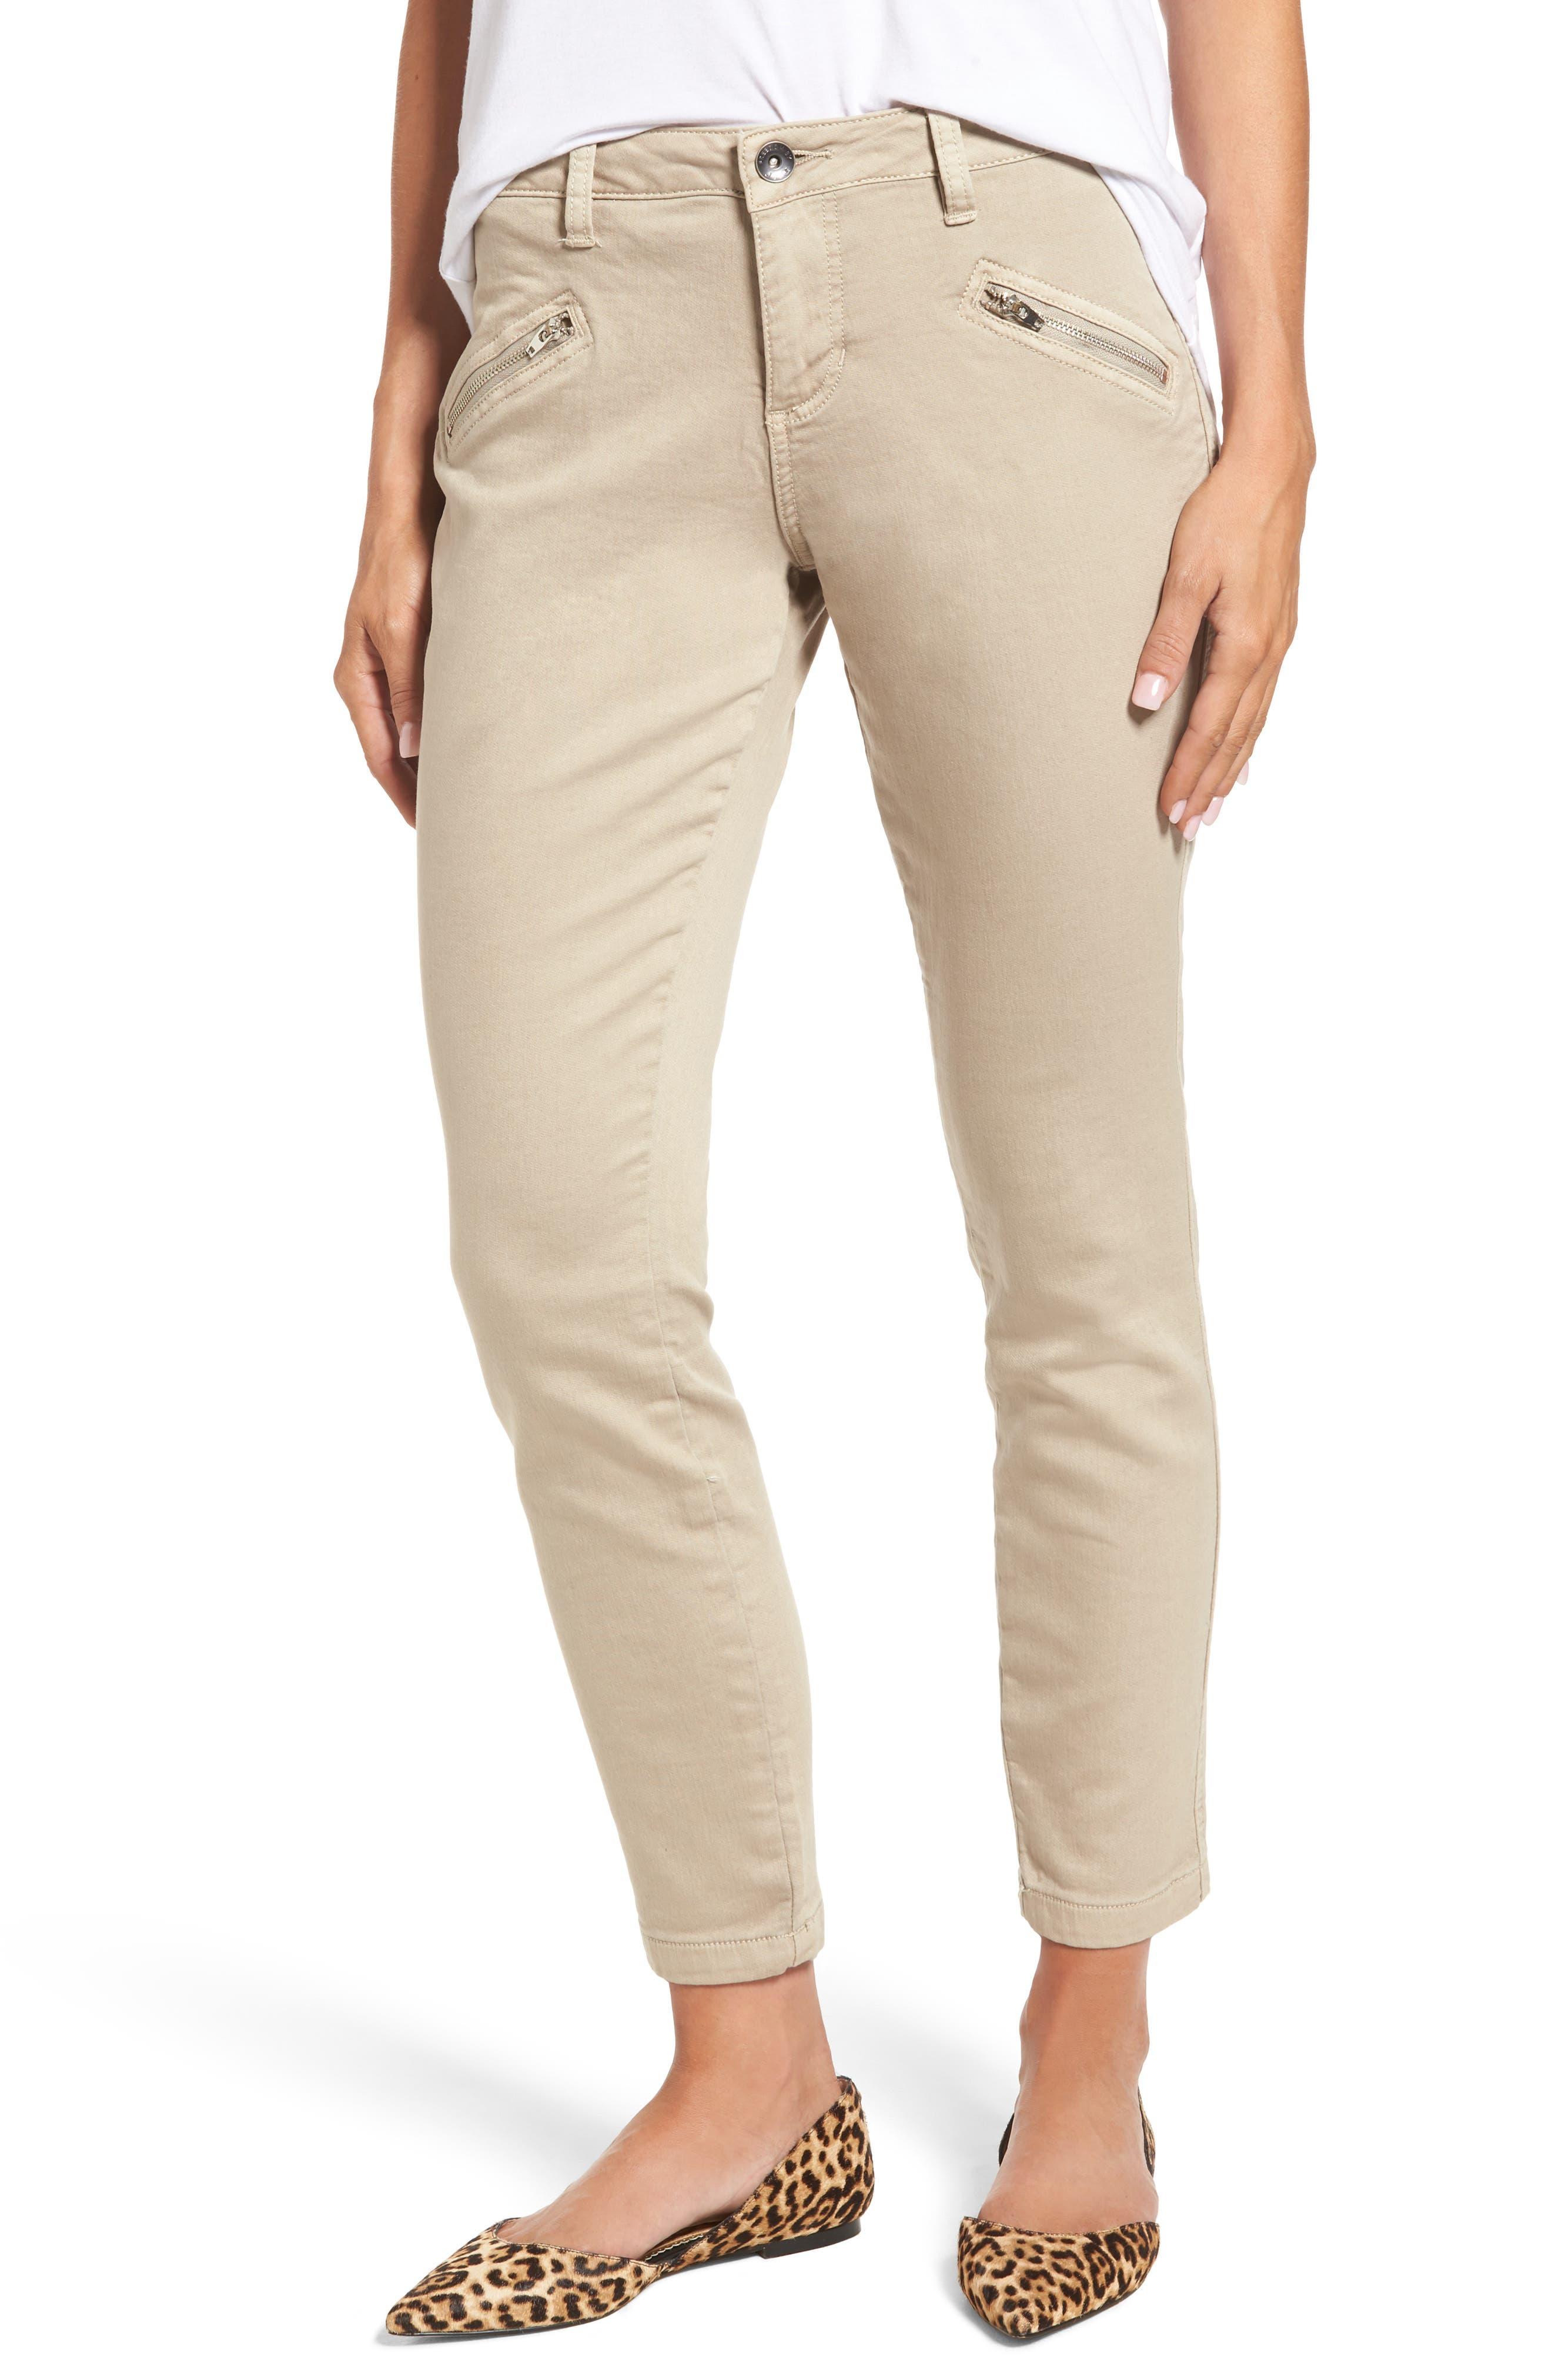 Main Image - Jag Jeans Ryan Knit Skinny Jeans (Birchwood)